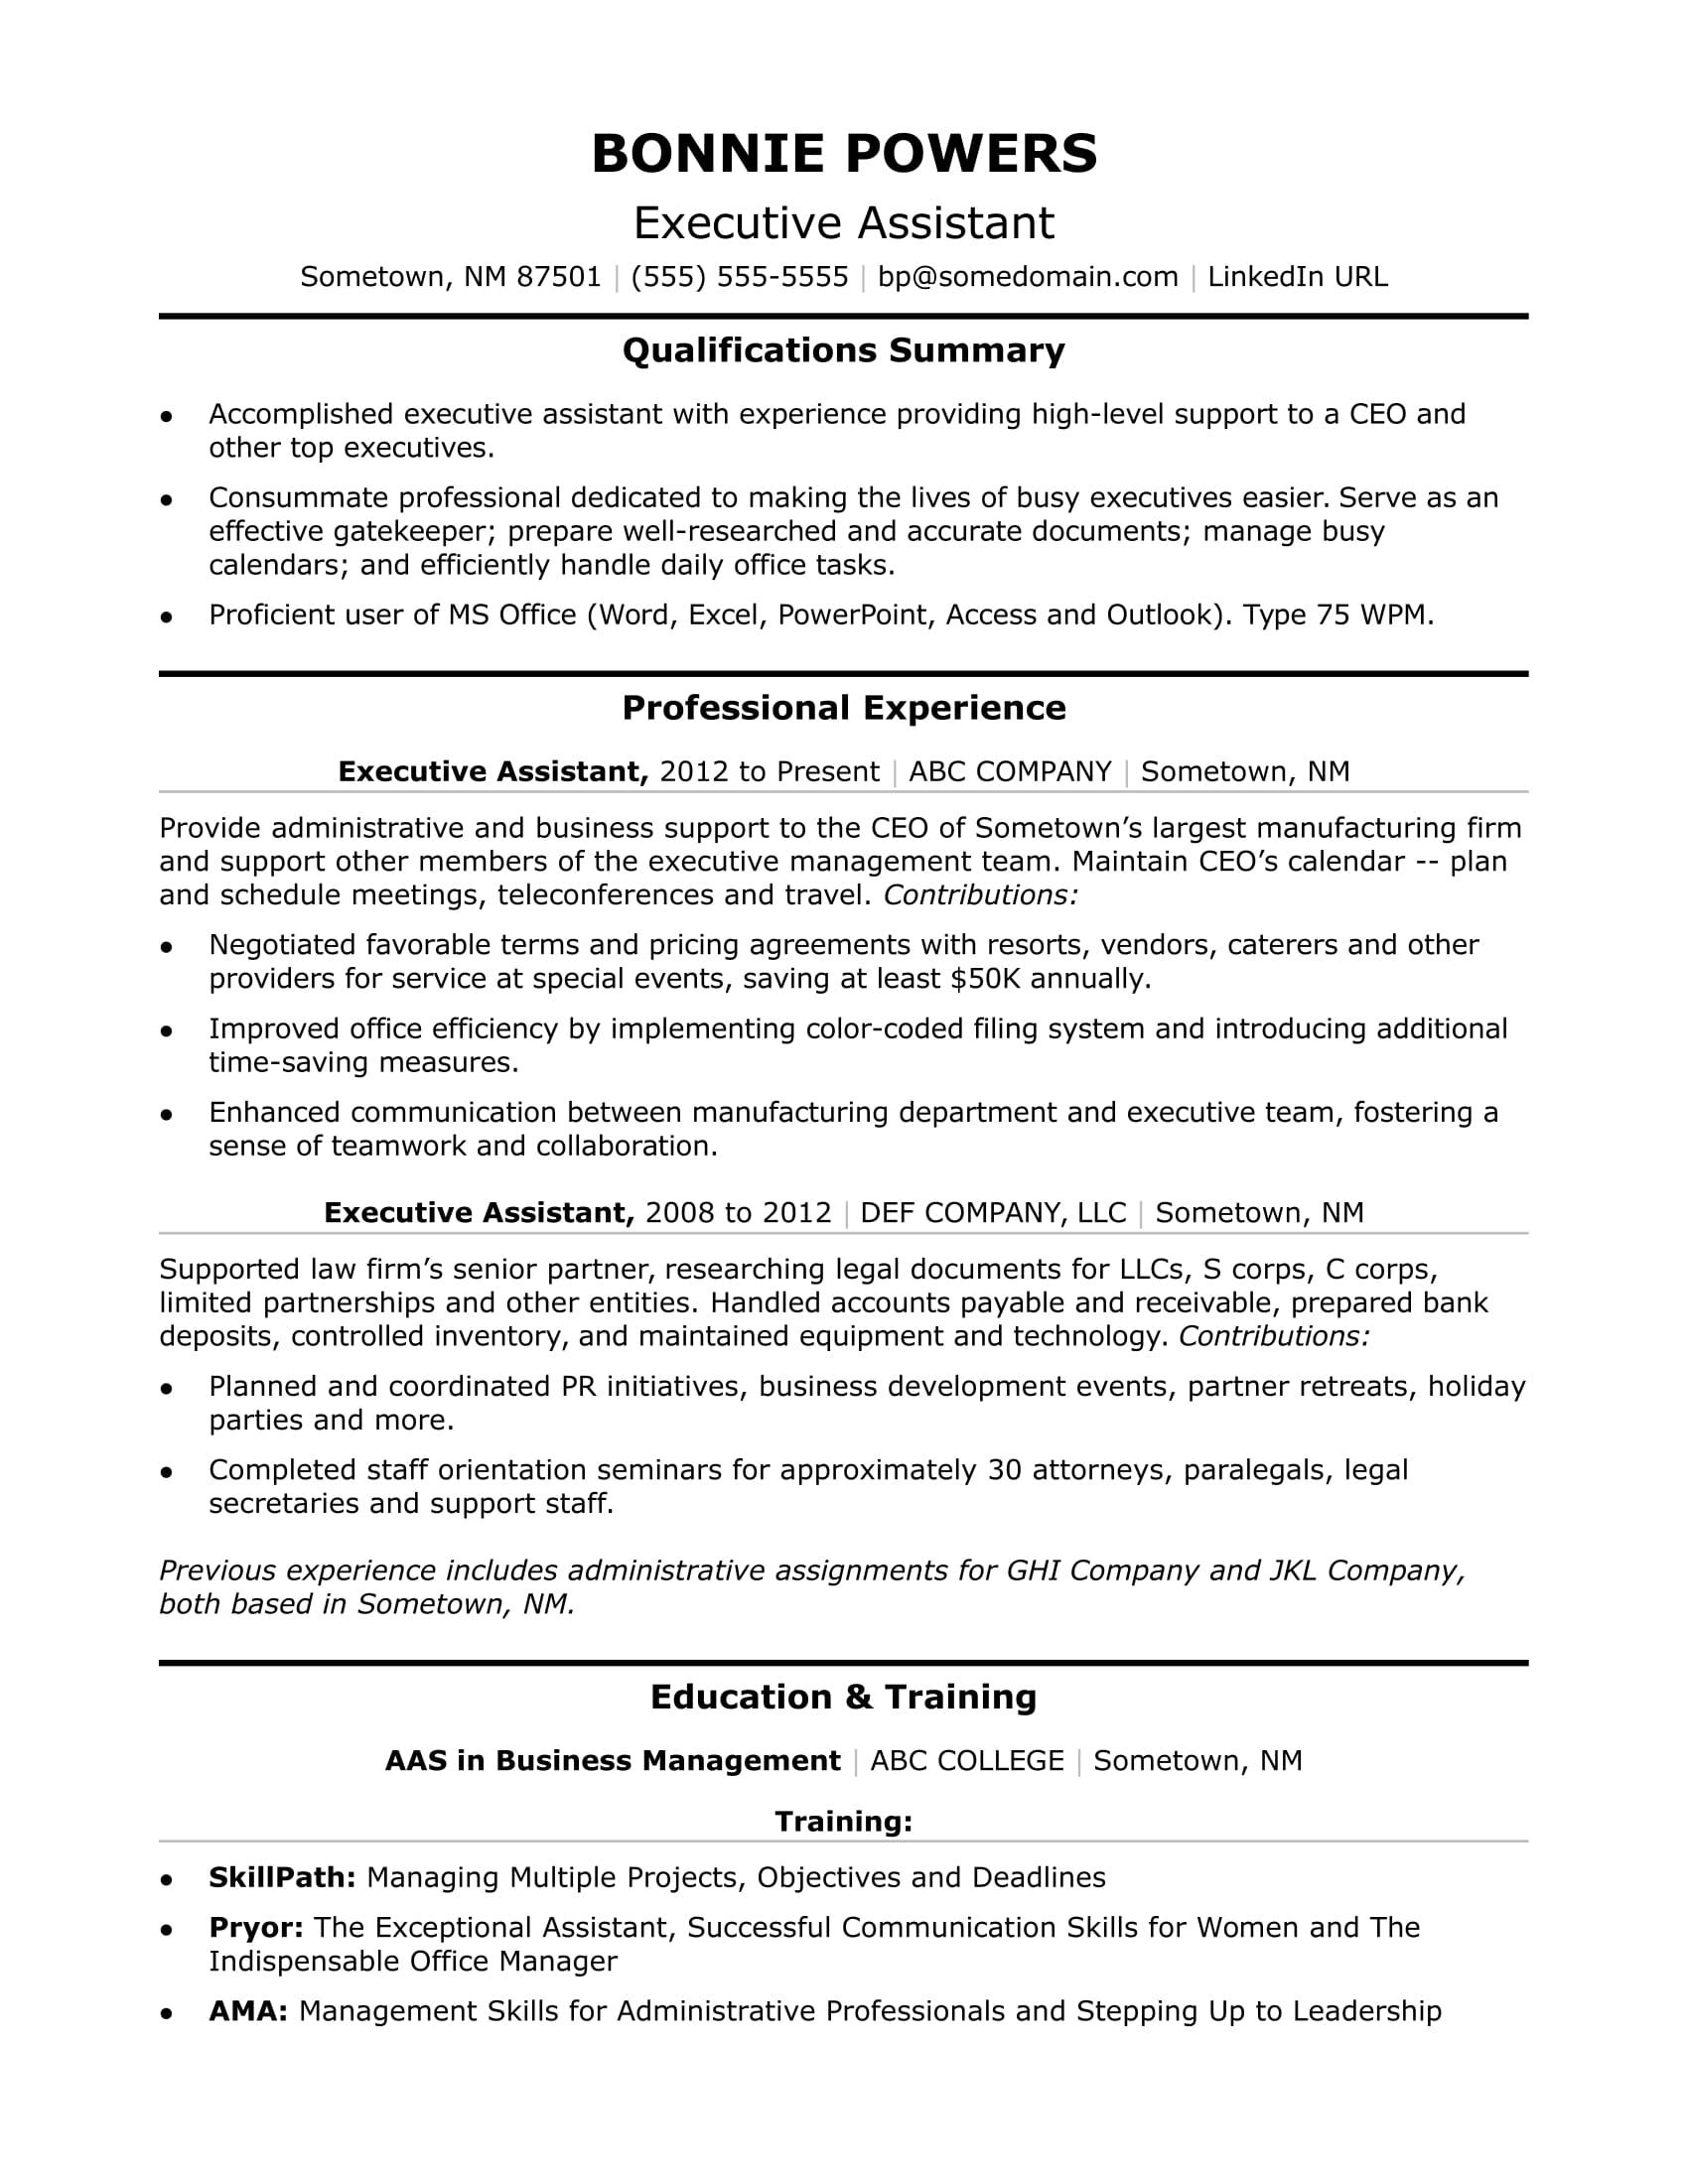 Executive Administrative Assistant Resume Sample Monstercom